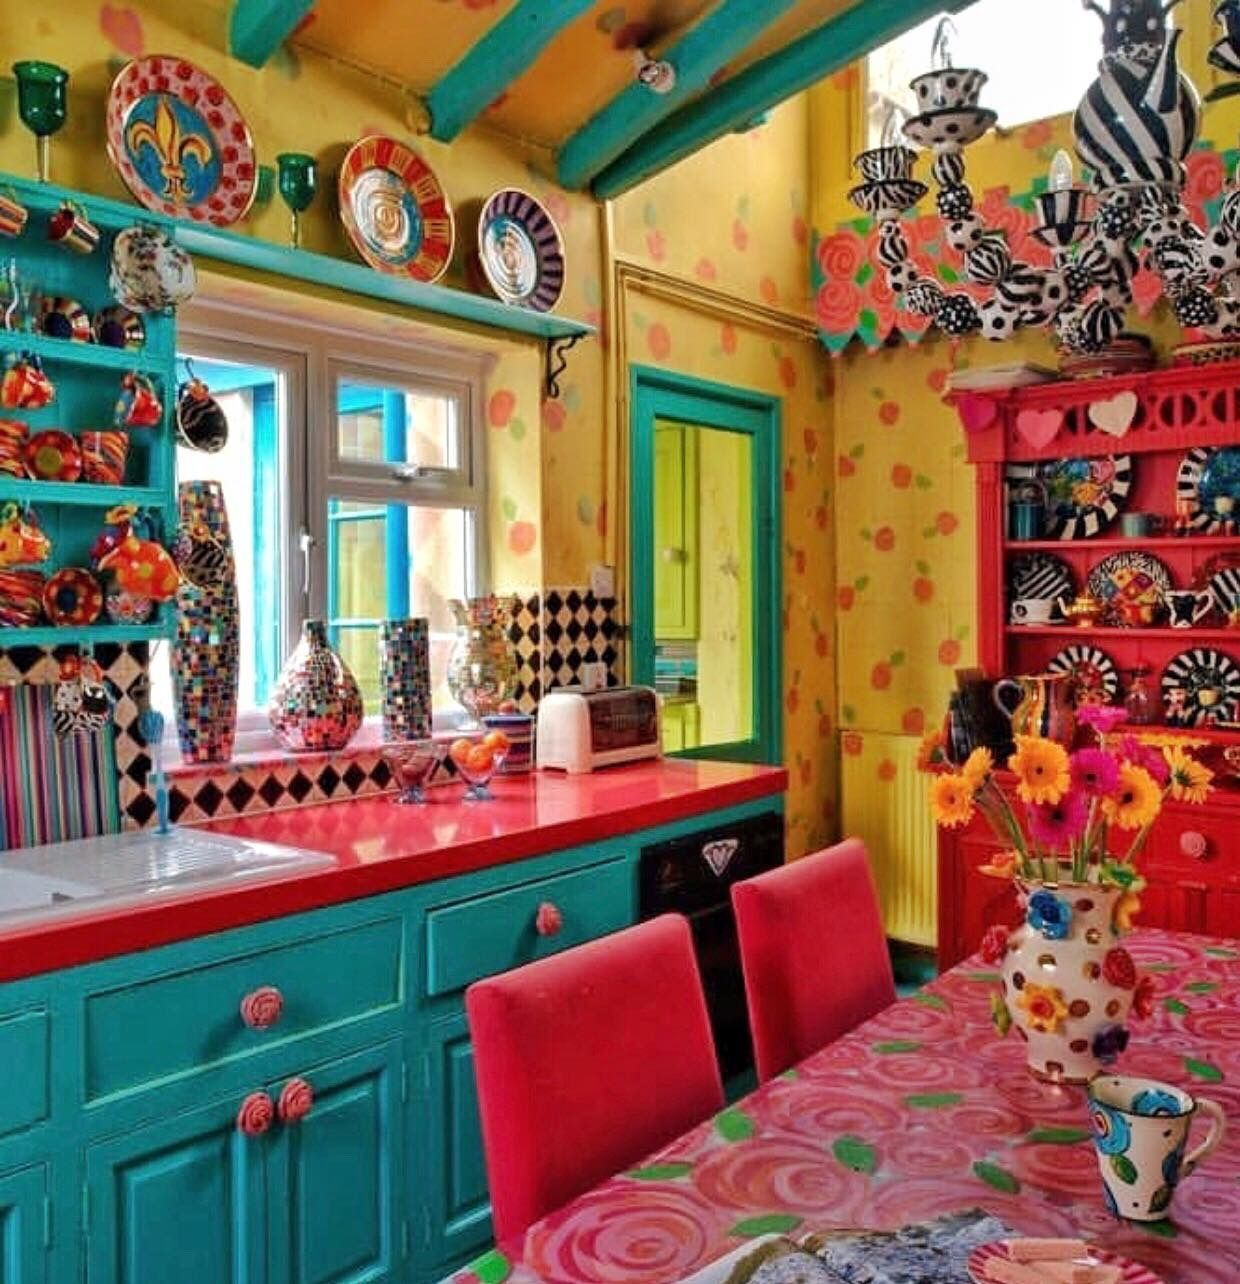 shelves for decor ideas #fireplace decor ideas modern #home decor